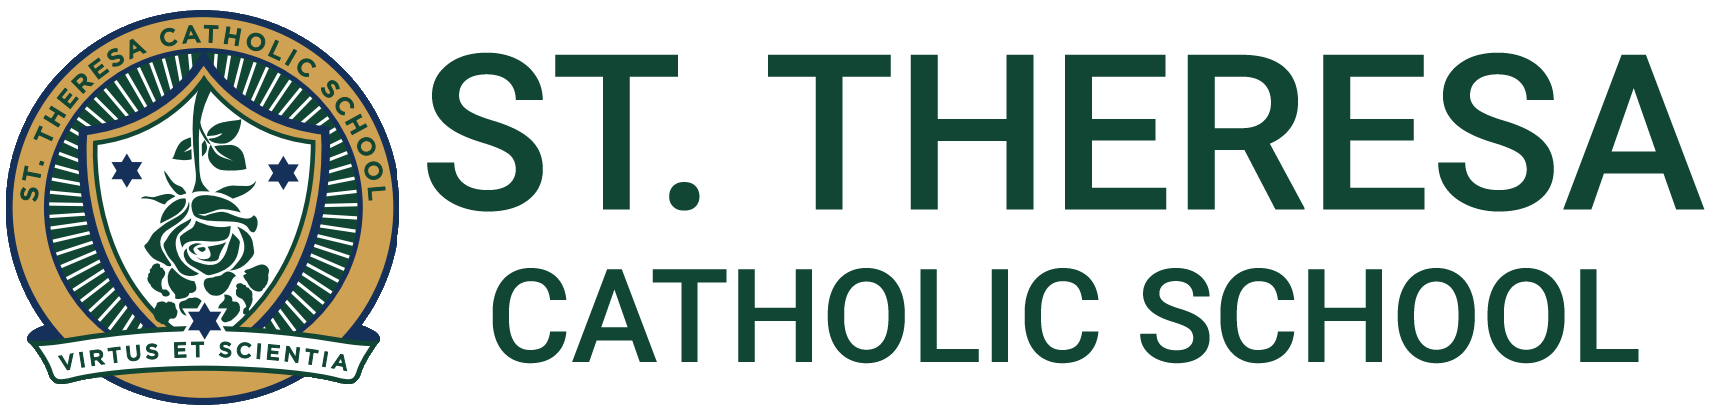 St Theresa Catholic School Logo